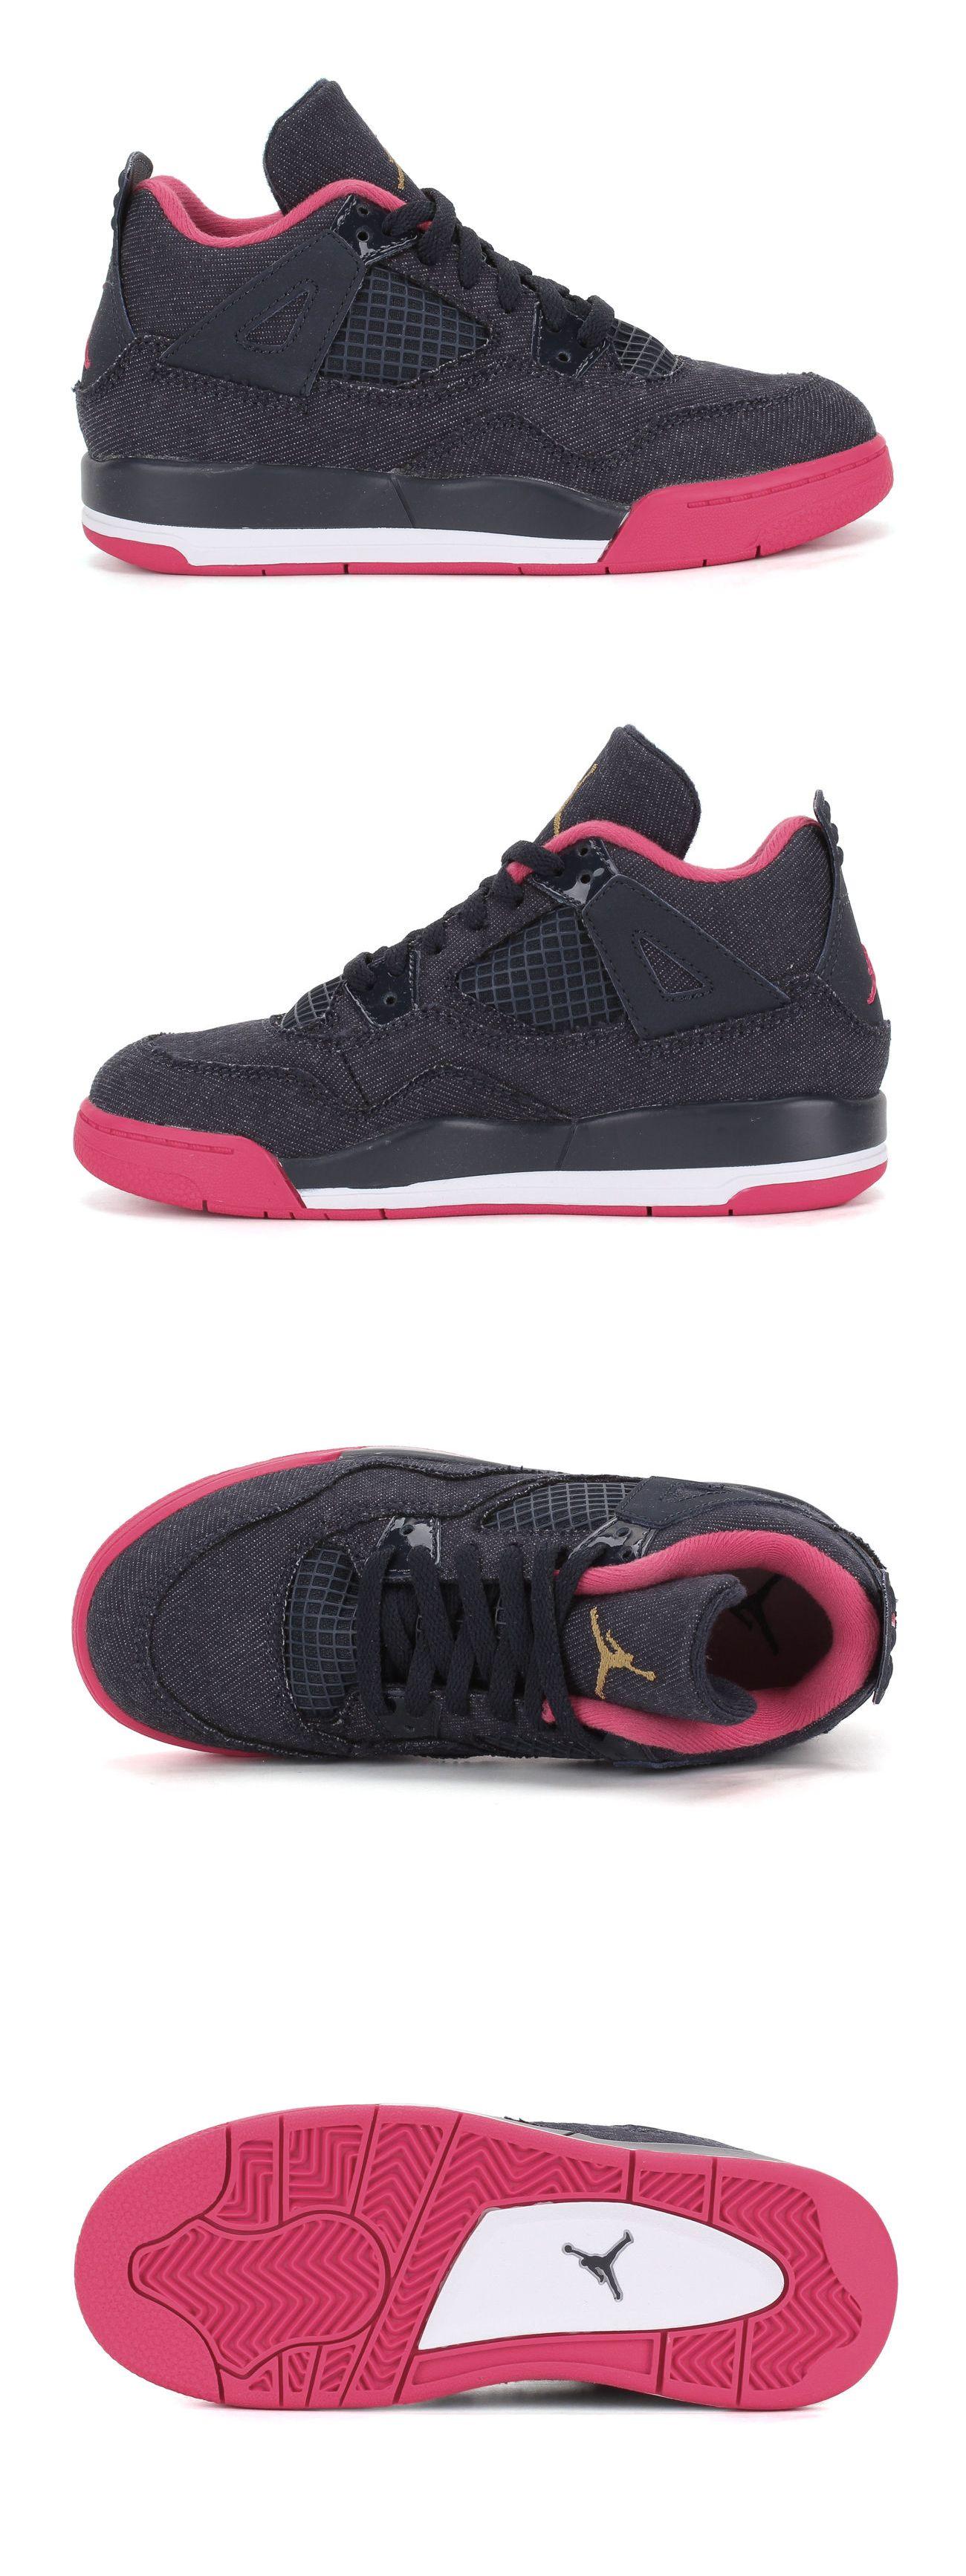 9dd1103b6b9e Unisex Shoes 155202  Nike Air Jordan Retro 4 Denim 487725 408 Youth Ps  Little Kids